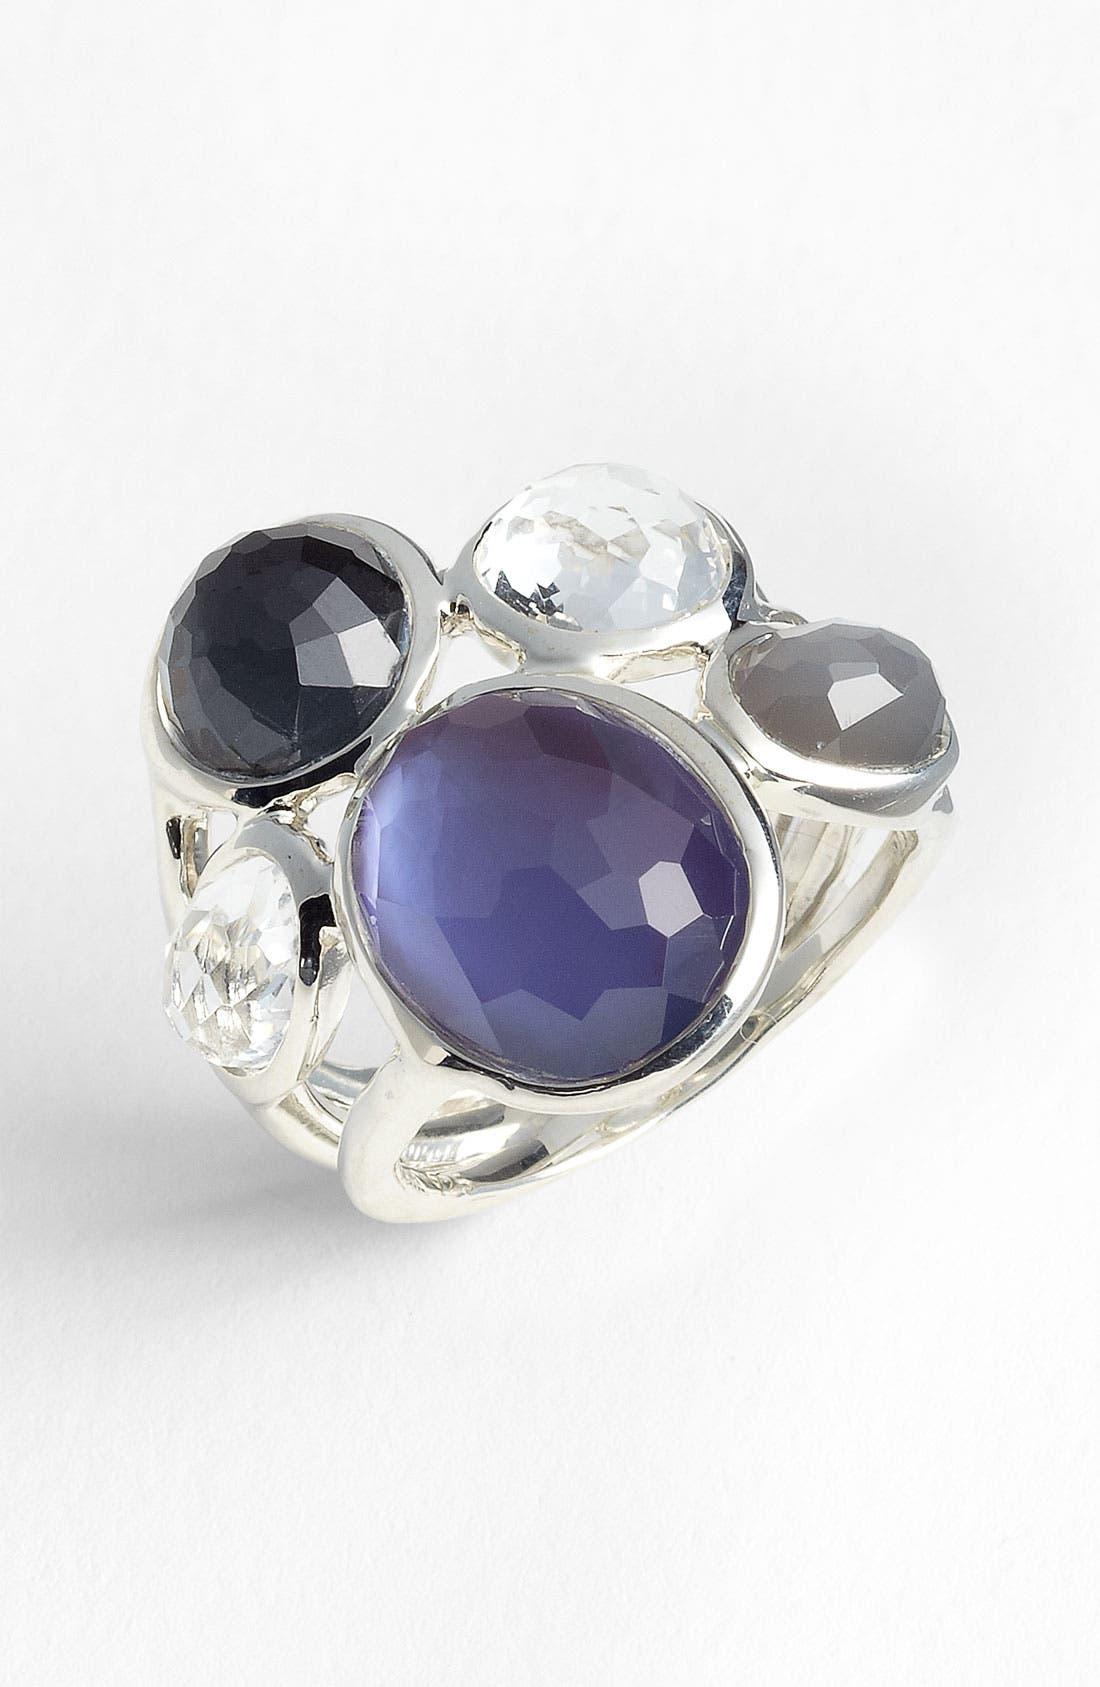 Main Image - Ippolita 'Wonderland' Cluster Statement Ring